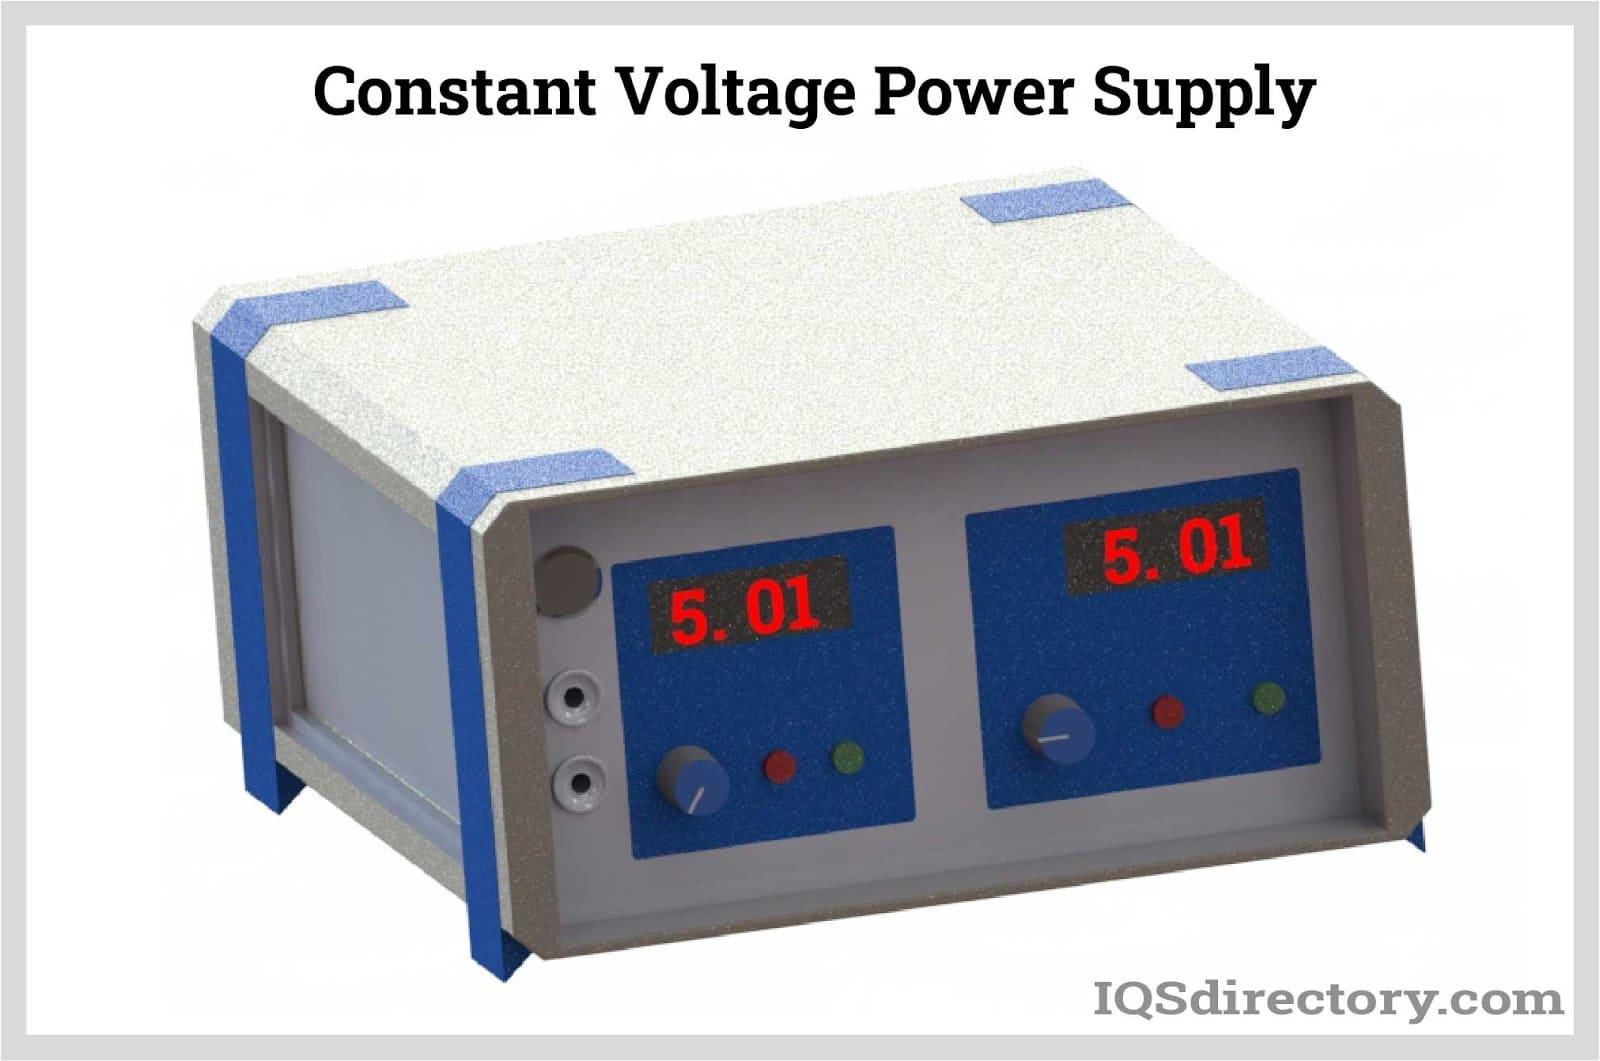 Constant Voltage Power Supply